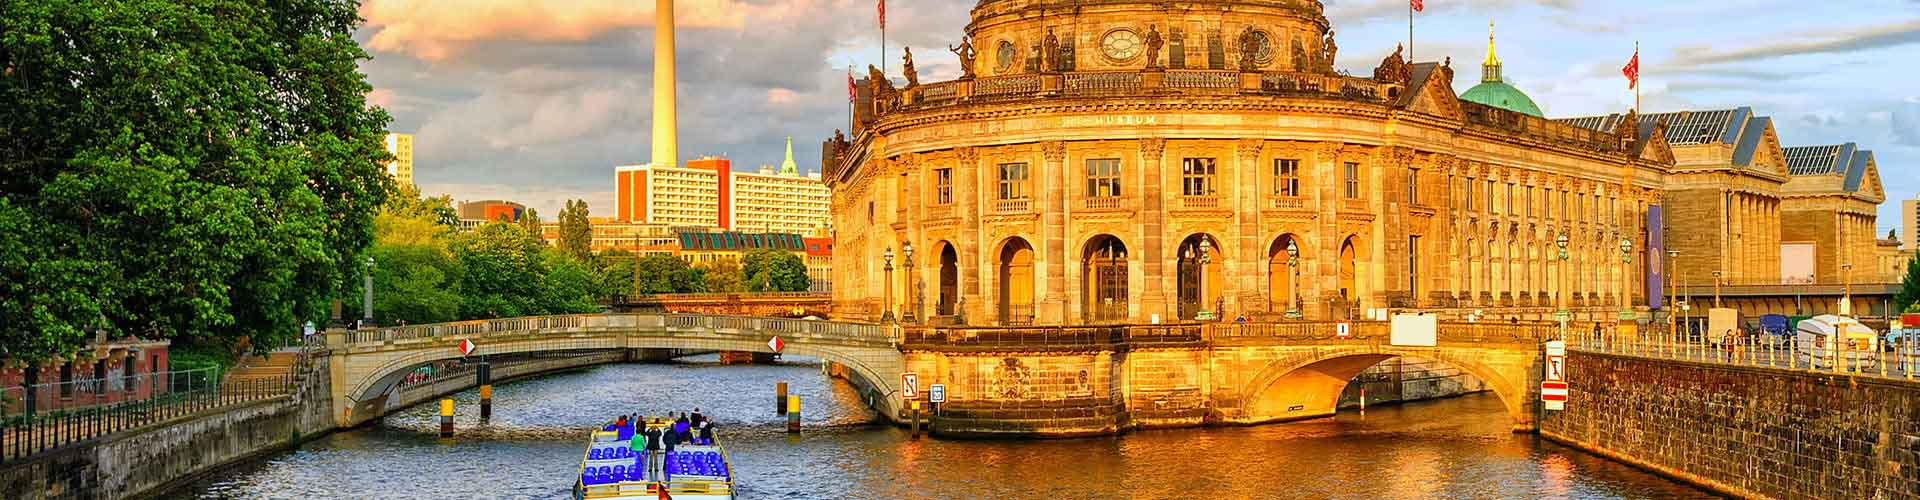 Berlín - Hoteles baratos en Berlín. Mapas de Berlín, Fotos y Comentarios para cada alojamiento en Berlín.